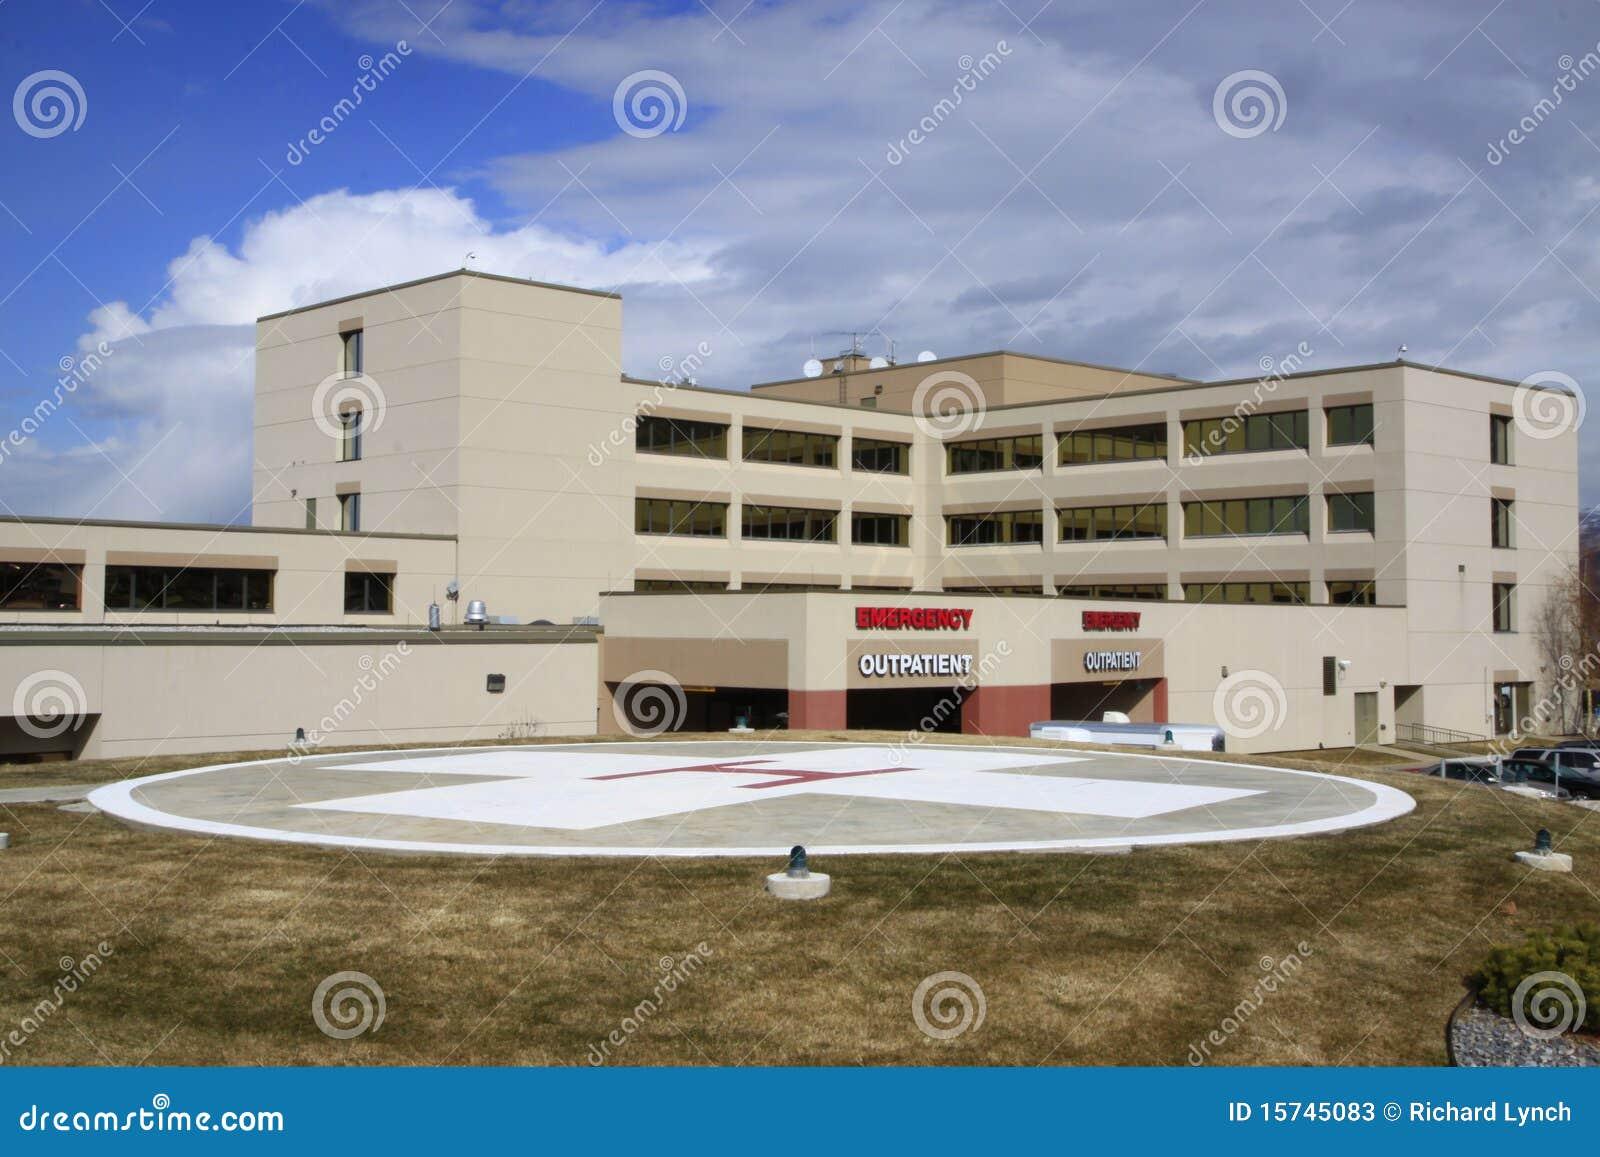 Hospital & Helipad Stock Photos - Image: 15745083